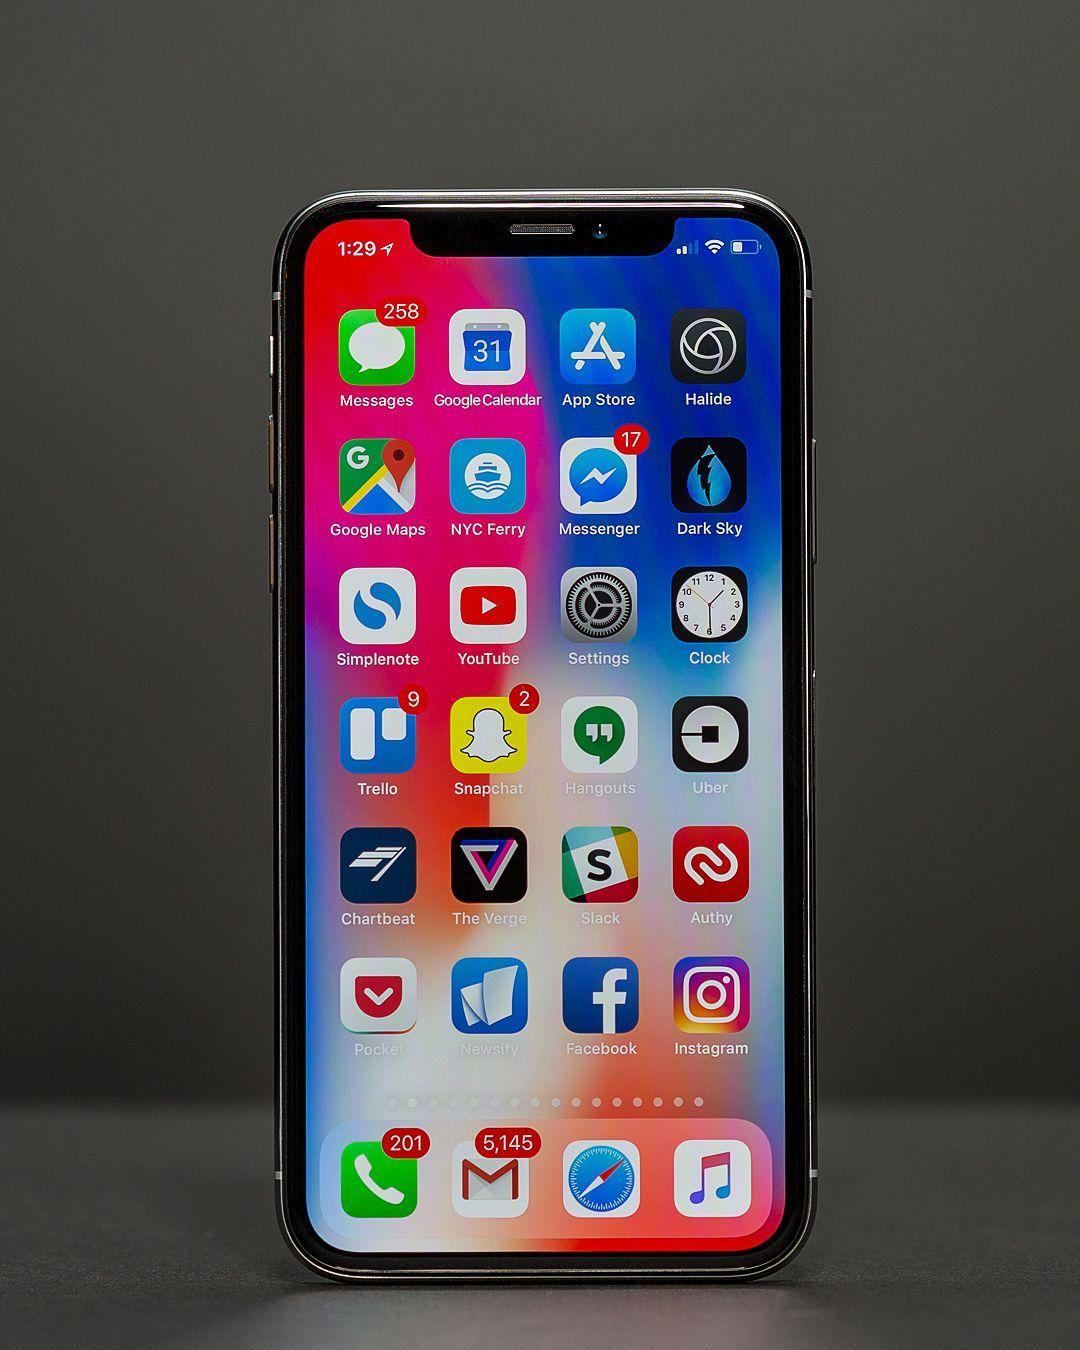 Ad Shopping Samsung Technology Android Design Iphone Vs Samsung Ios Samsung Galaxy Cheap People Acces Apple Smartphone Apple Iphone Apple Technology